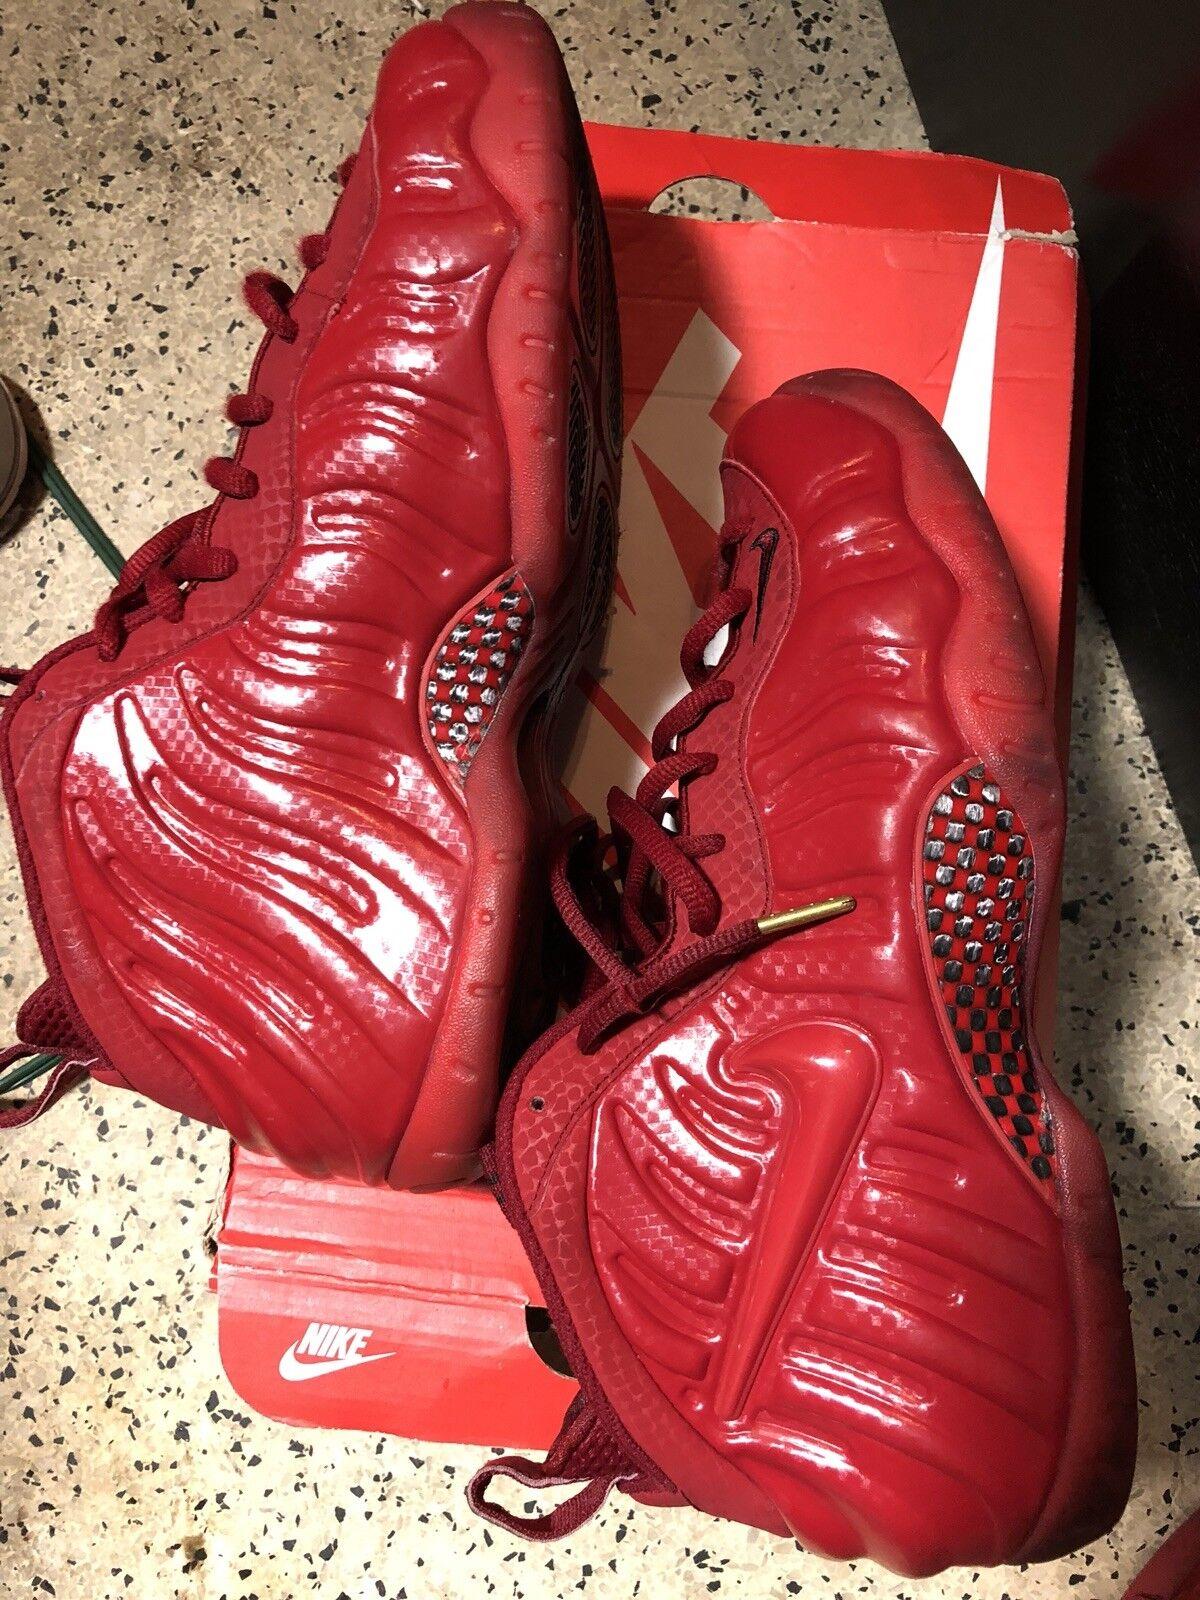 quality design f101d a2606 Nike Air Foamposite PRO Gym Gym Gym Red October Size 10.5 efc80b